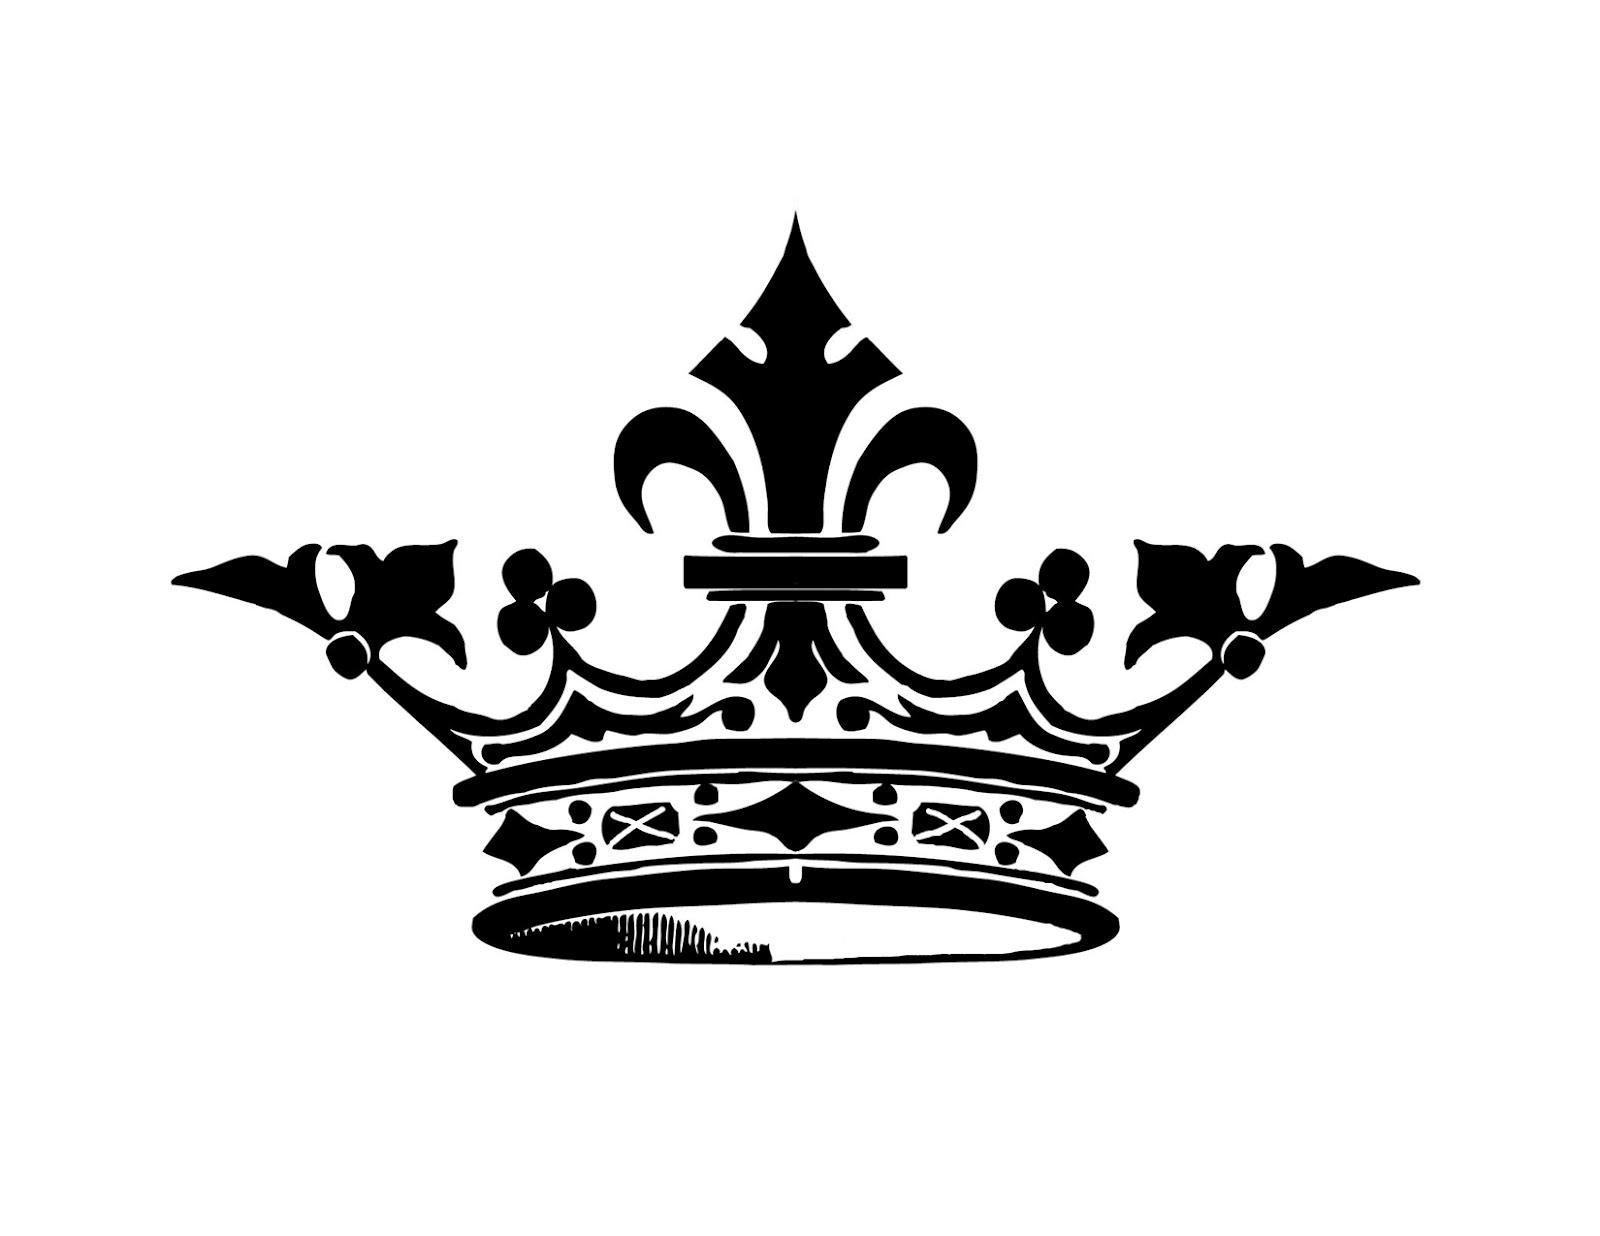 King Crown Silhouette